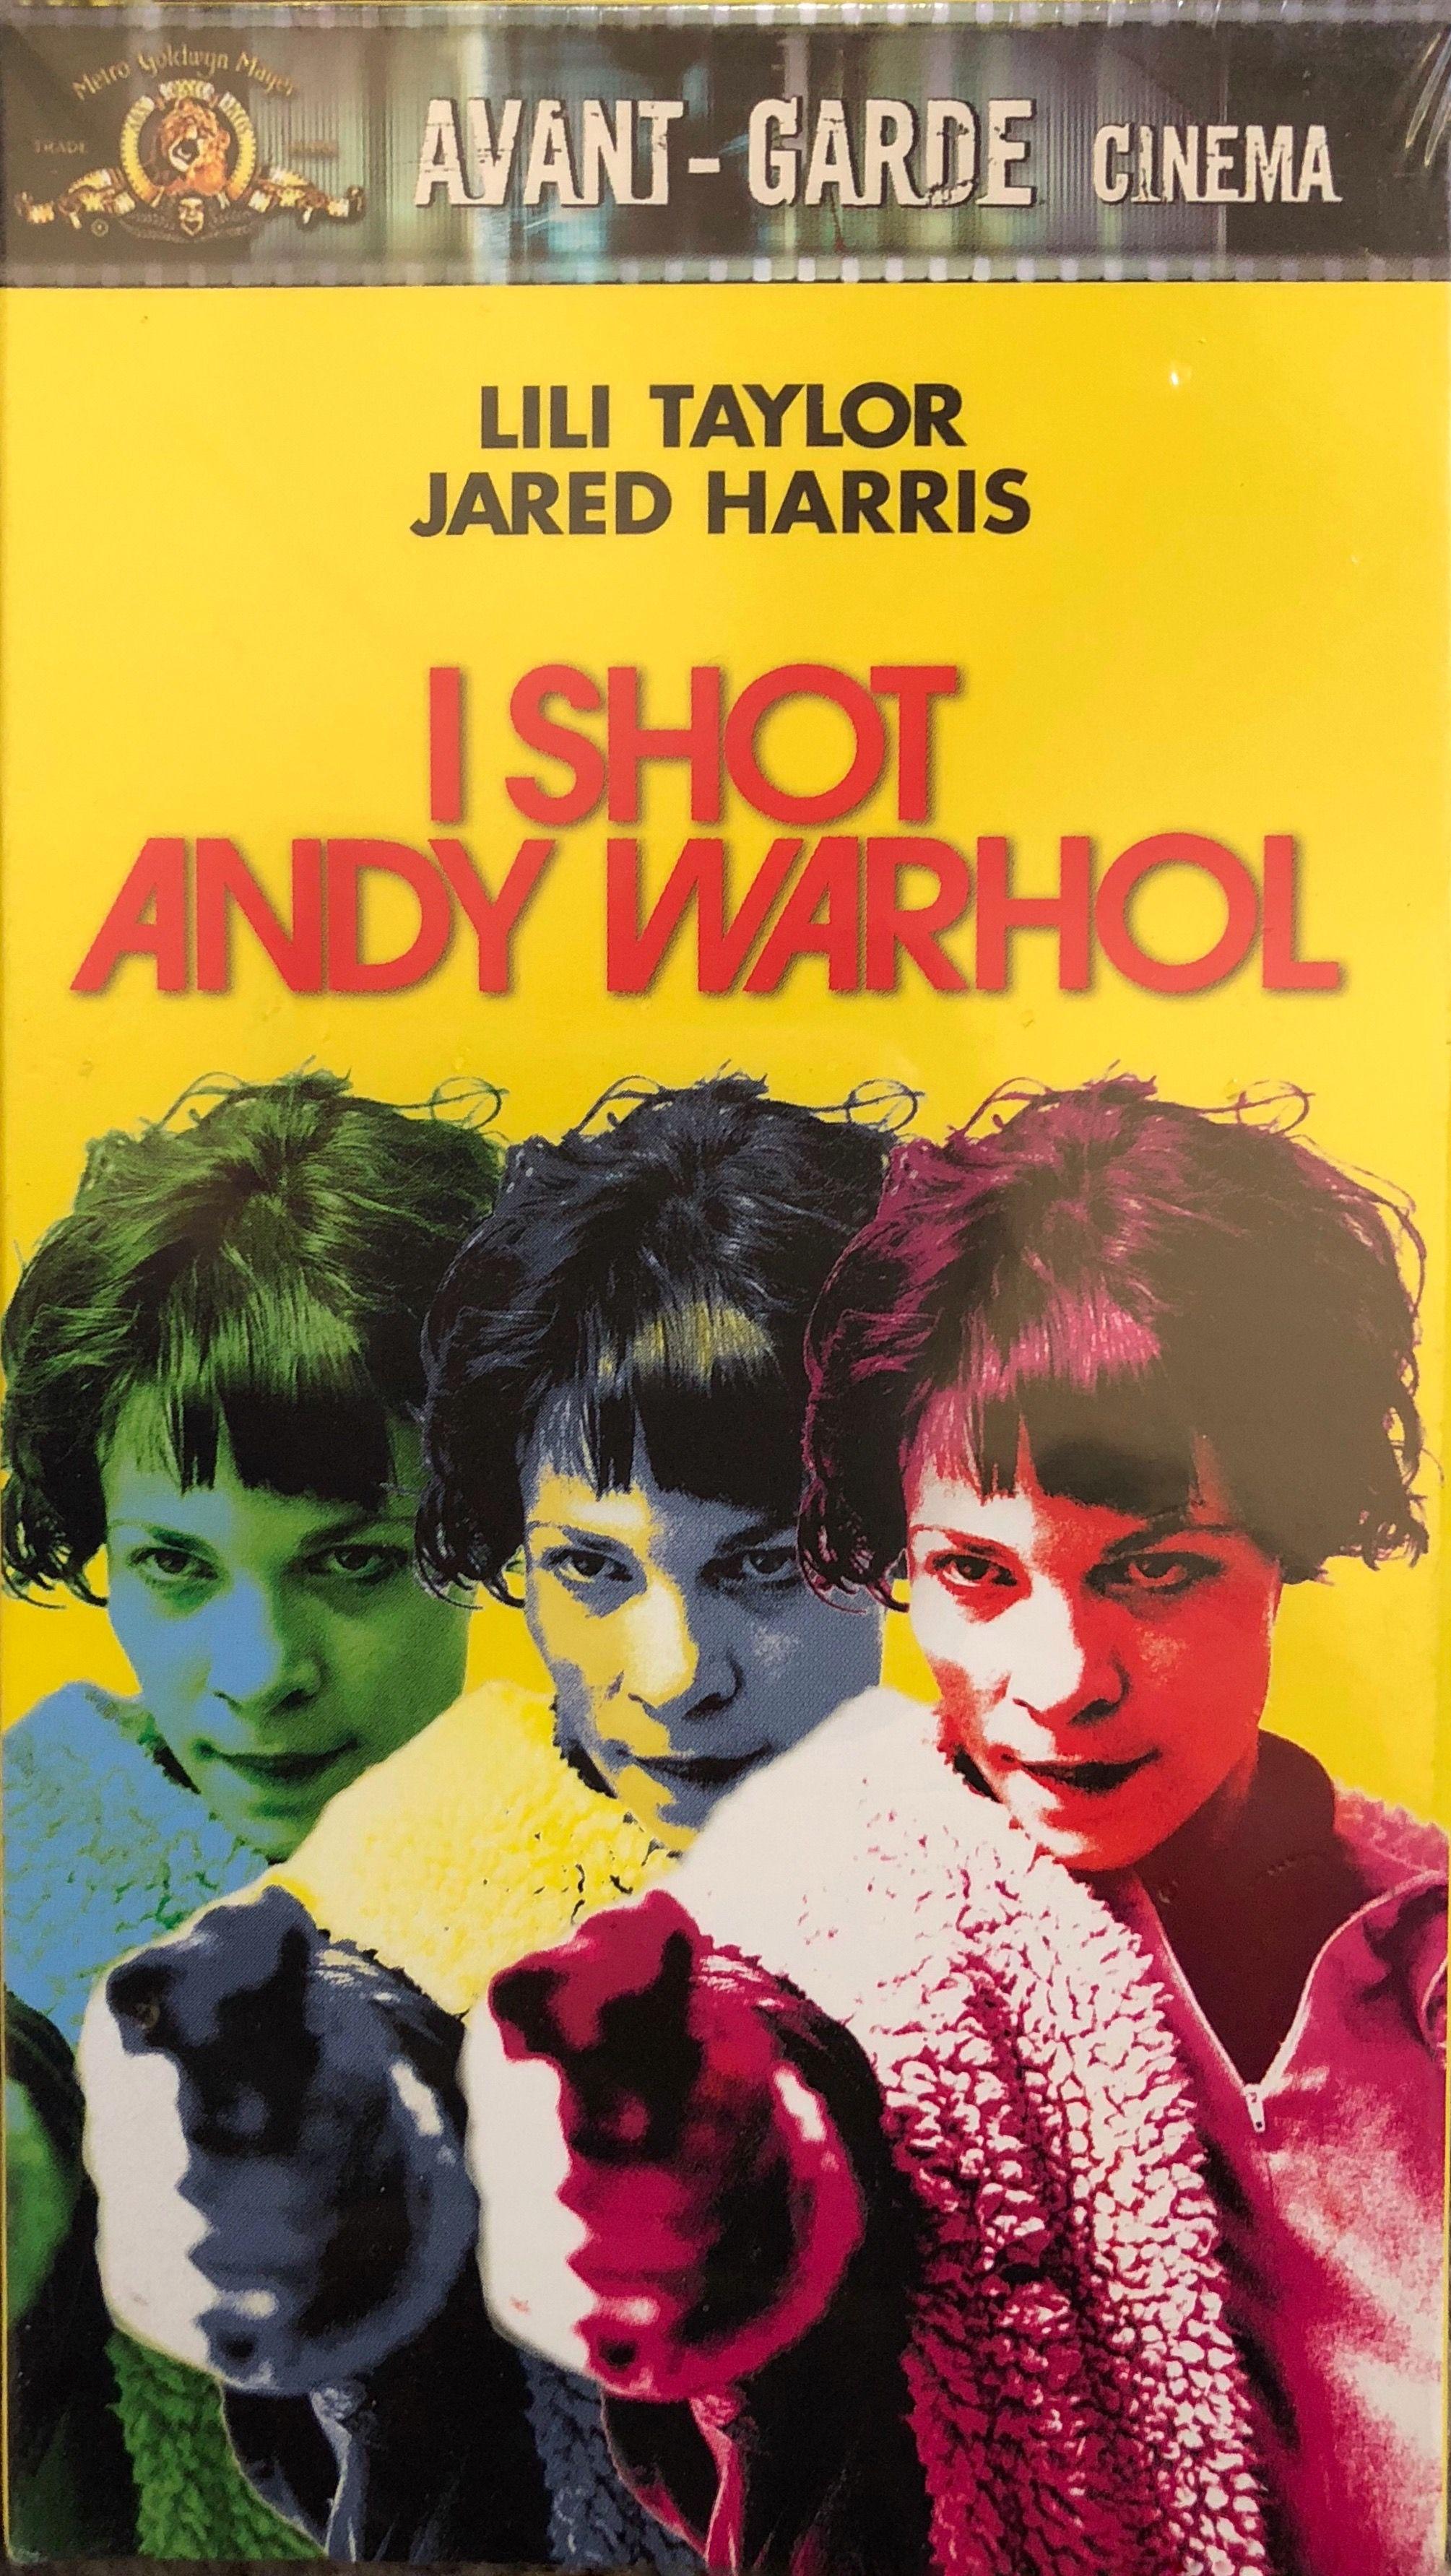 I Shot Andy Warhol | Andy warhol, Warhol, Warhol factory